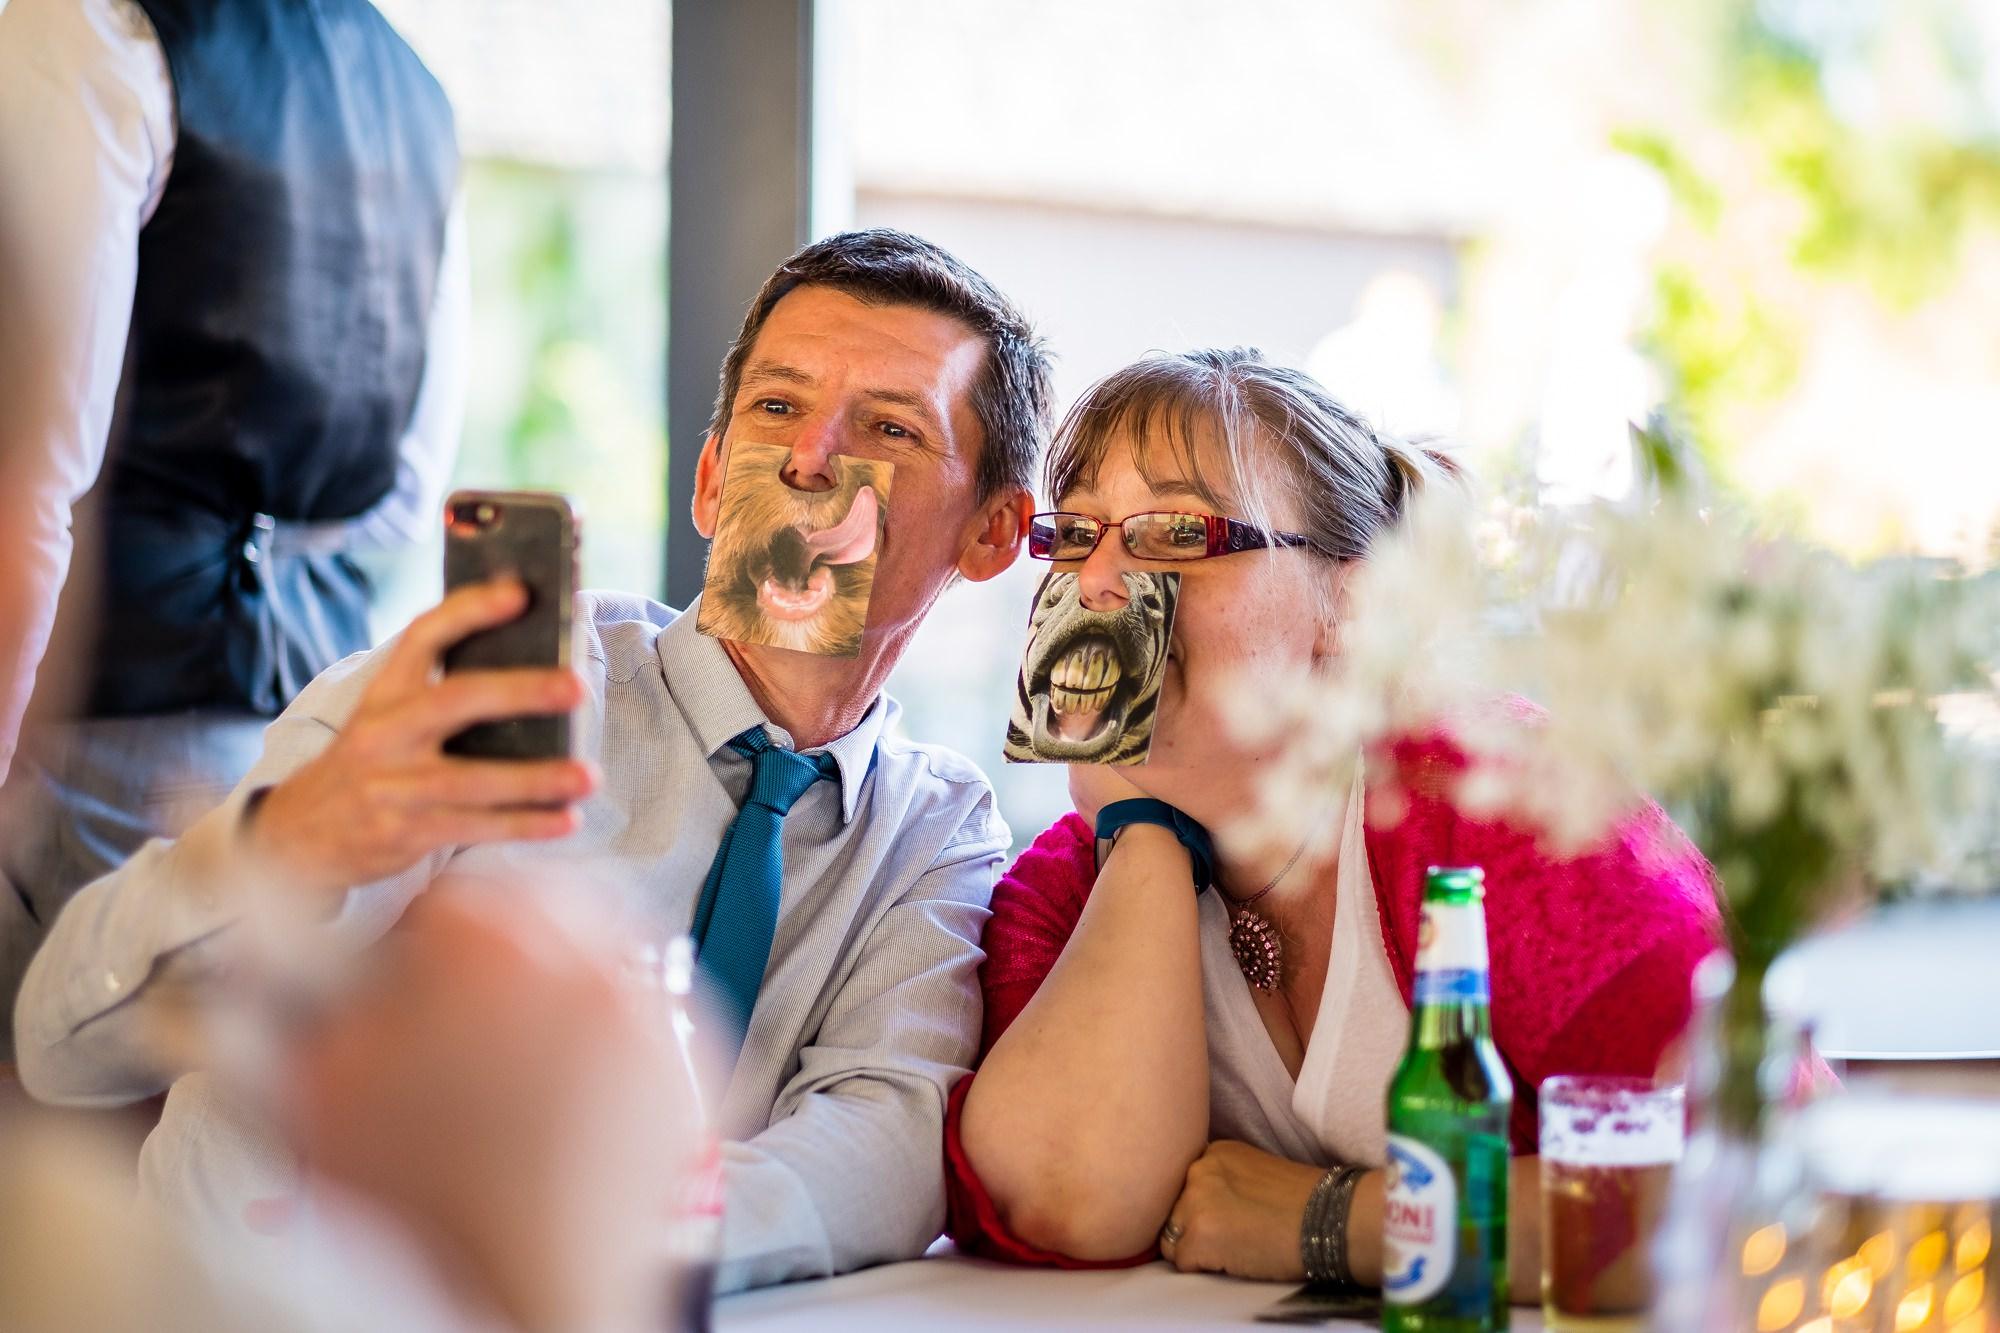 guests doing a selfie